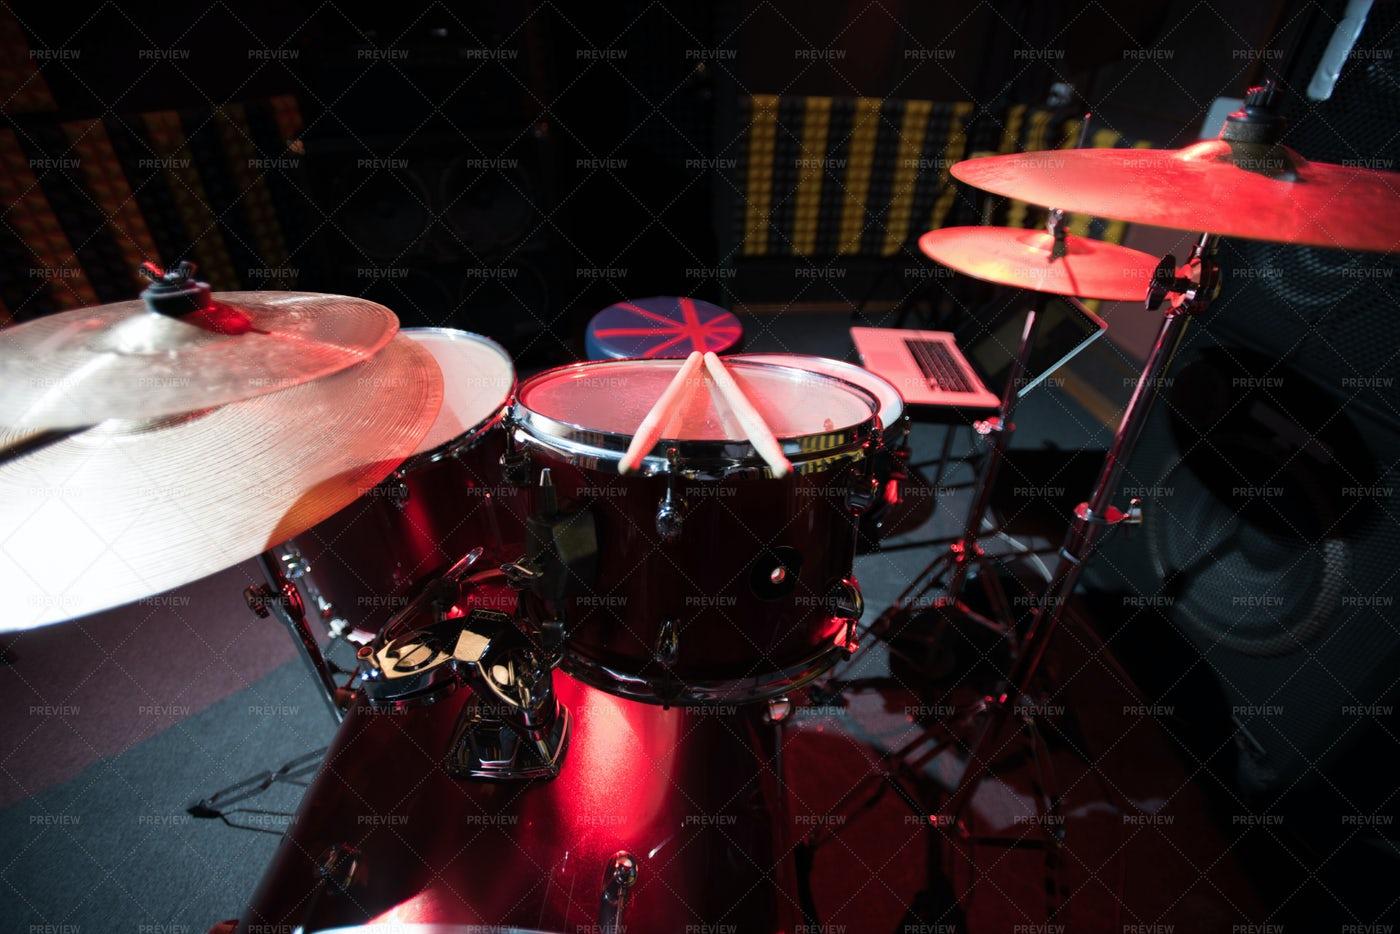 Drum Set On Stage: Stock Photos